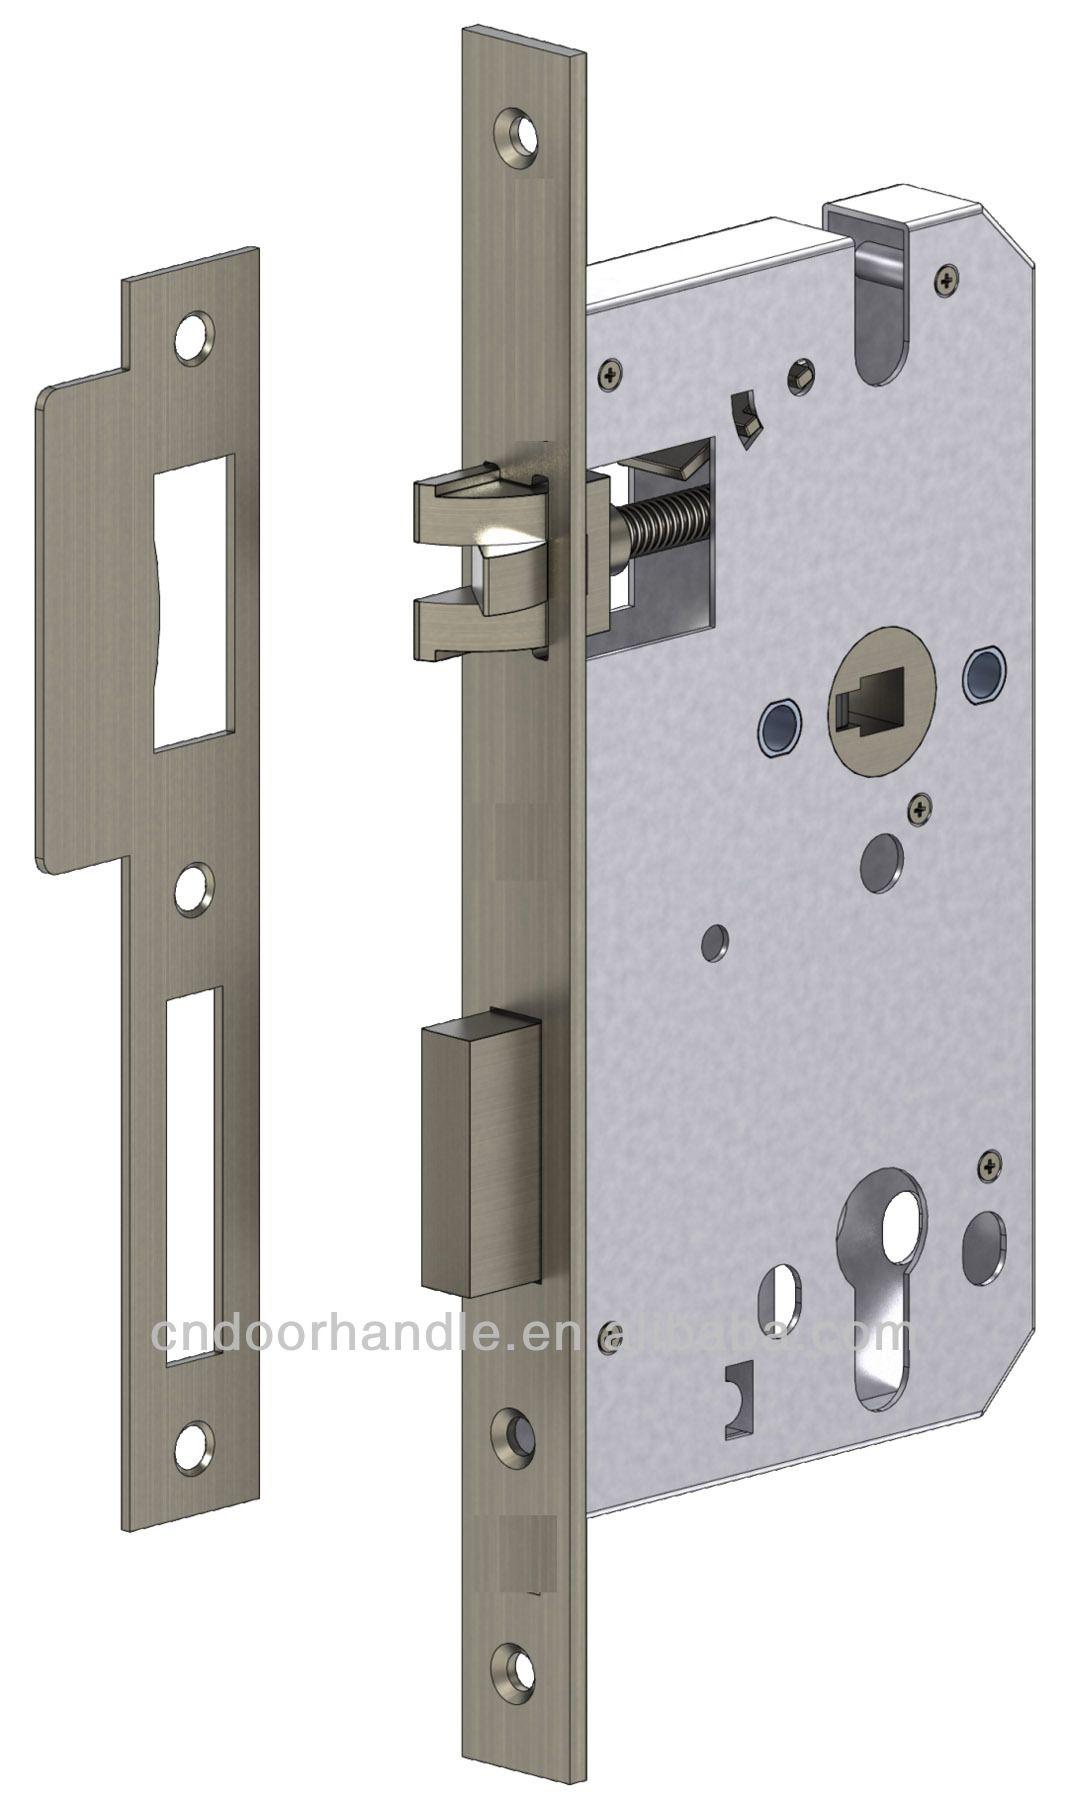 Fashional Design Turkey Security Door Locks 1 6 Door Lock Security Security Door Door Locks